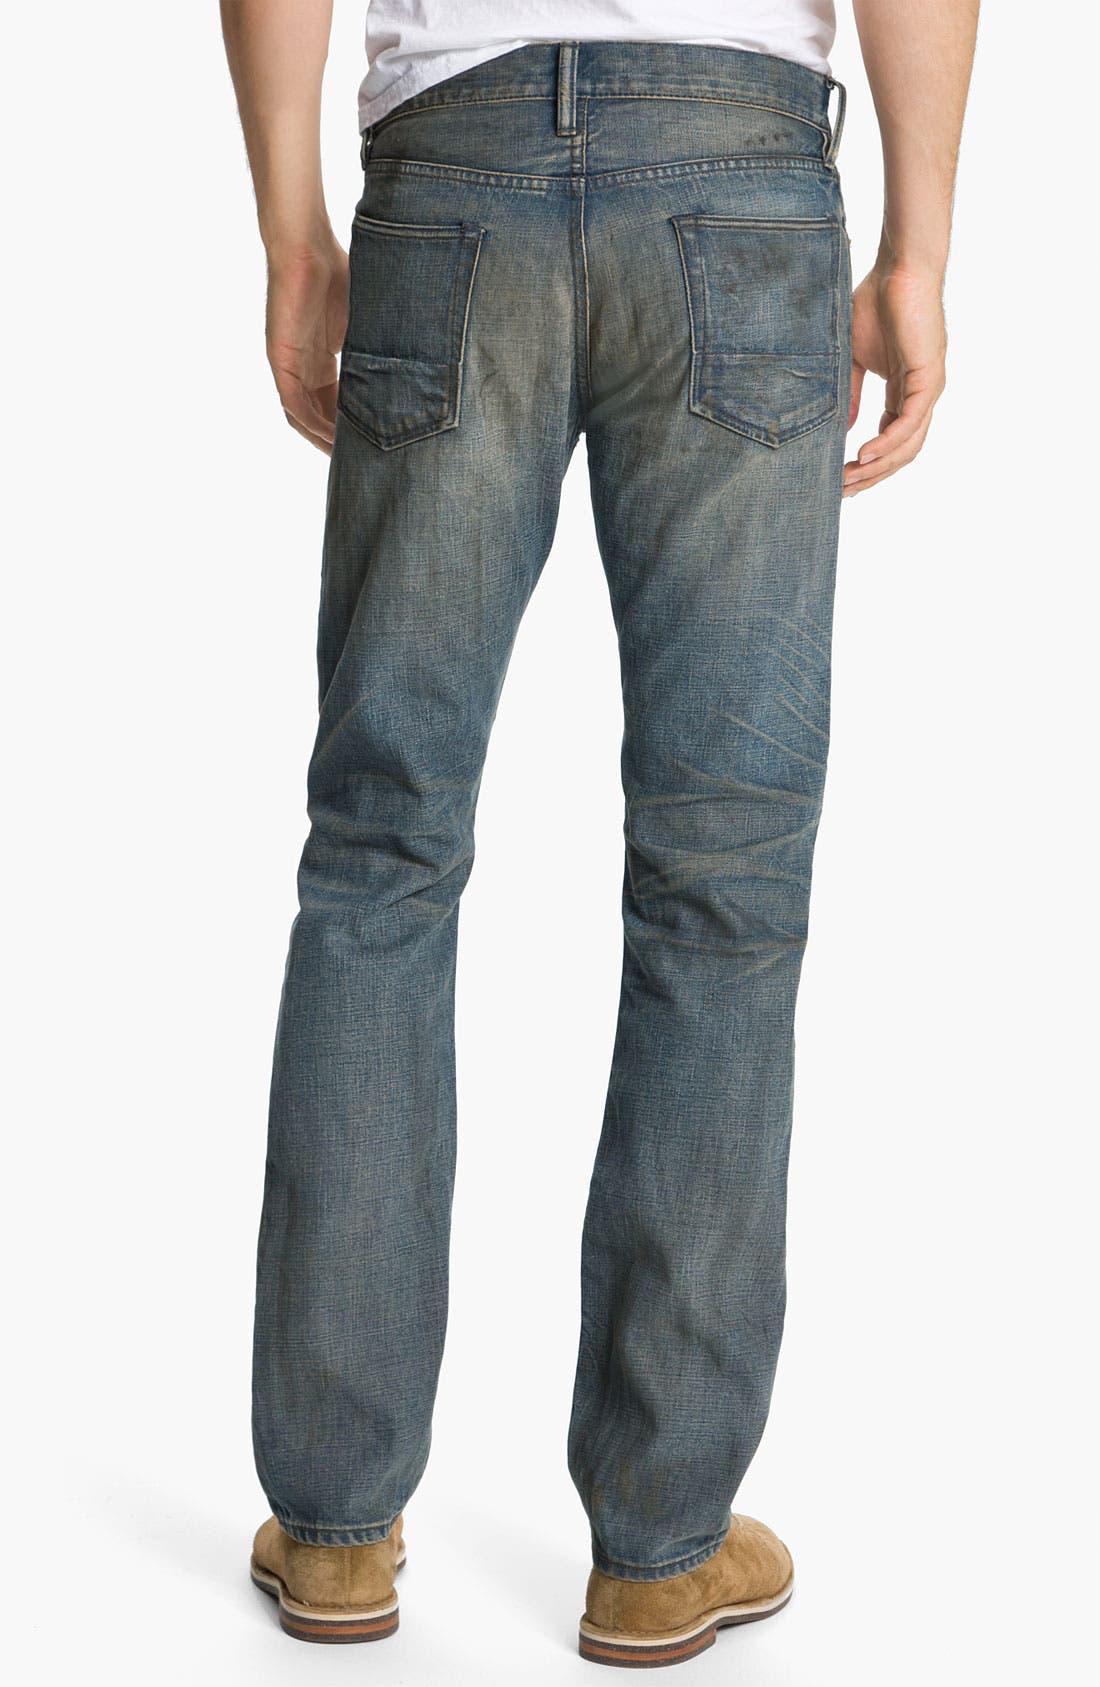 Alternate Image 1 Selected - NSF Clothing Straight Leg Jeans (Wilson)